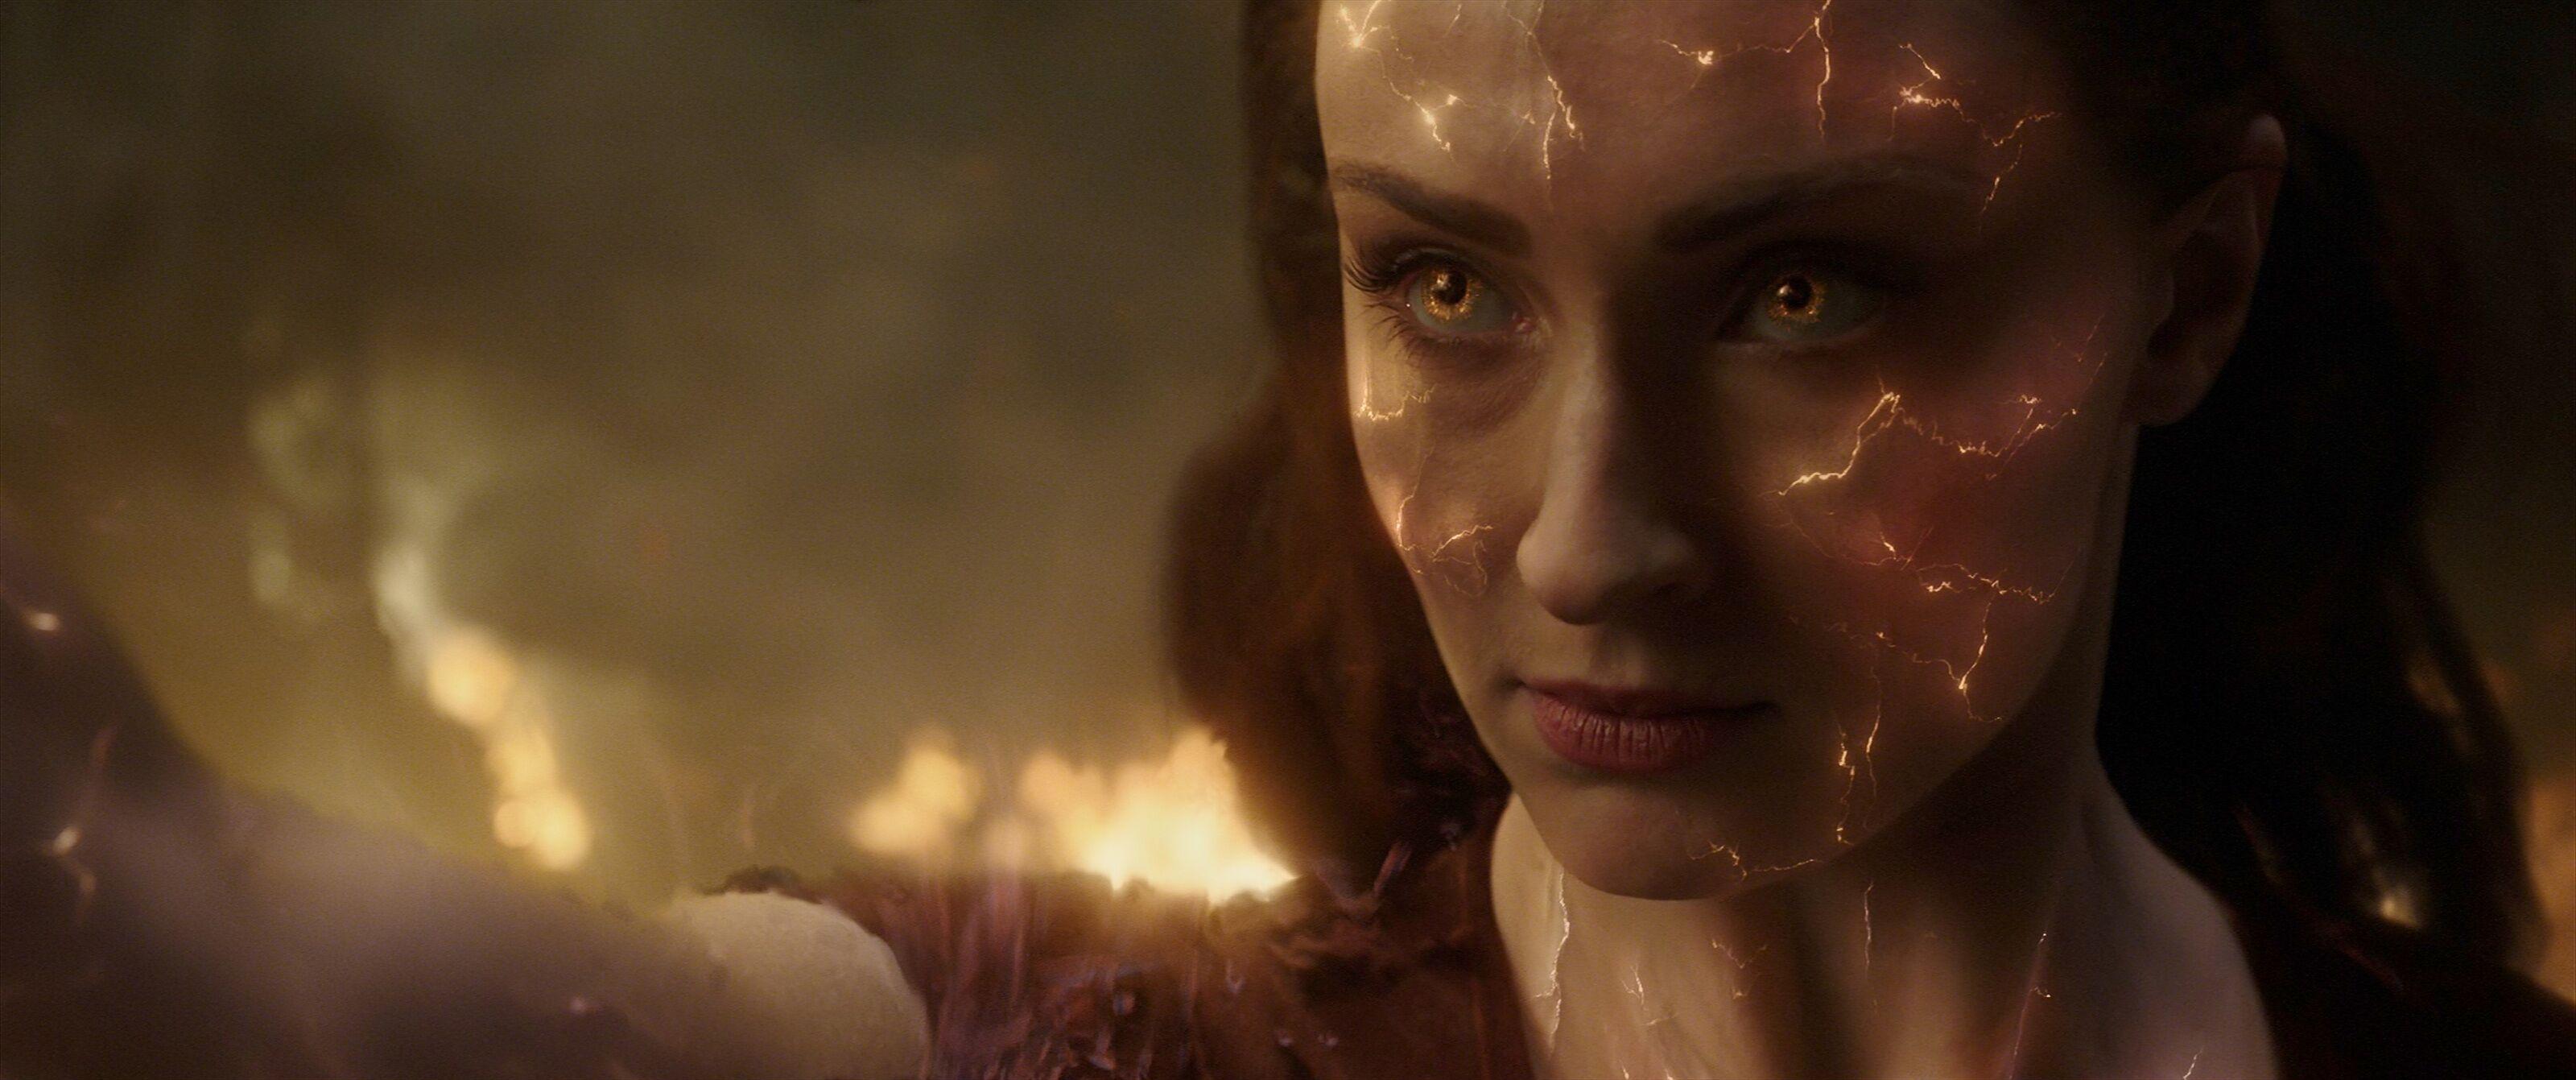 How Dark Phoenix pushes boundaries for the main X-Men series